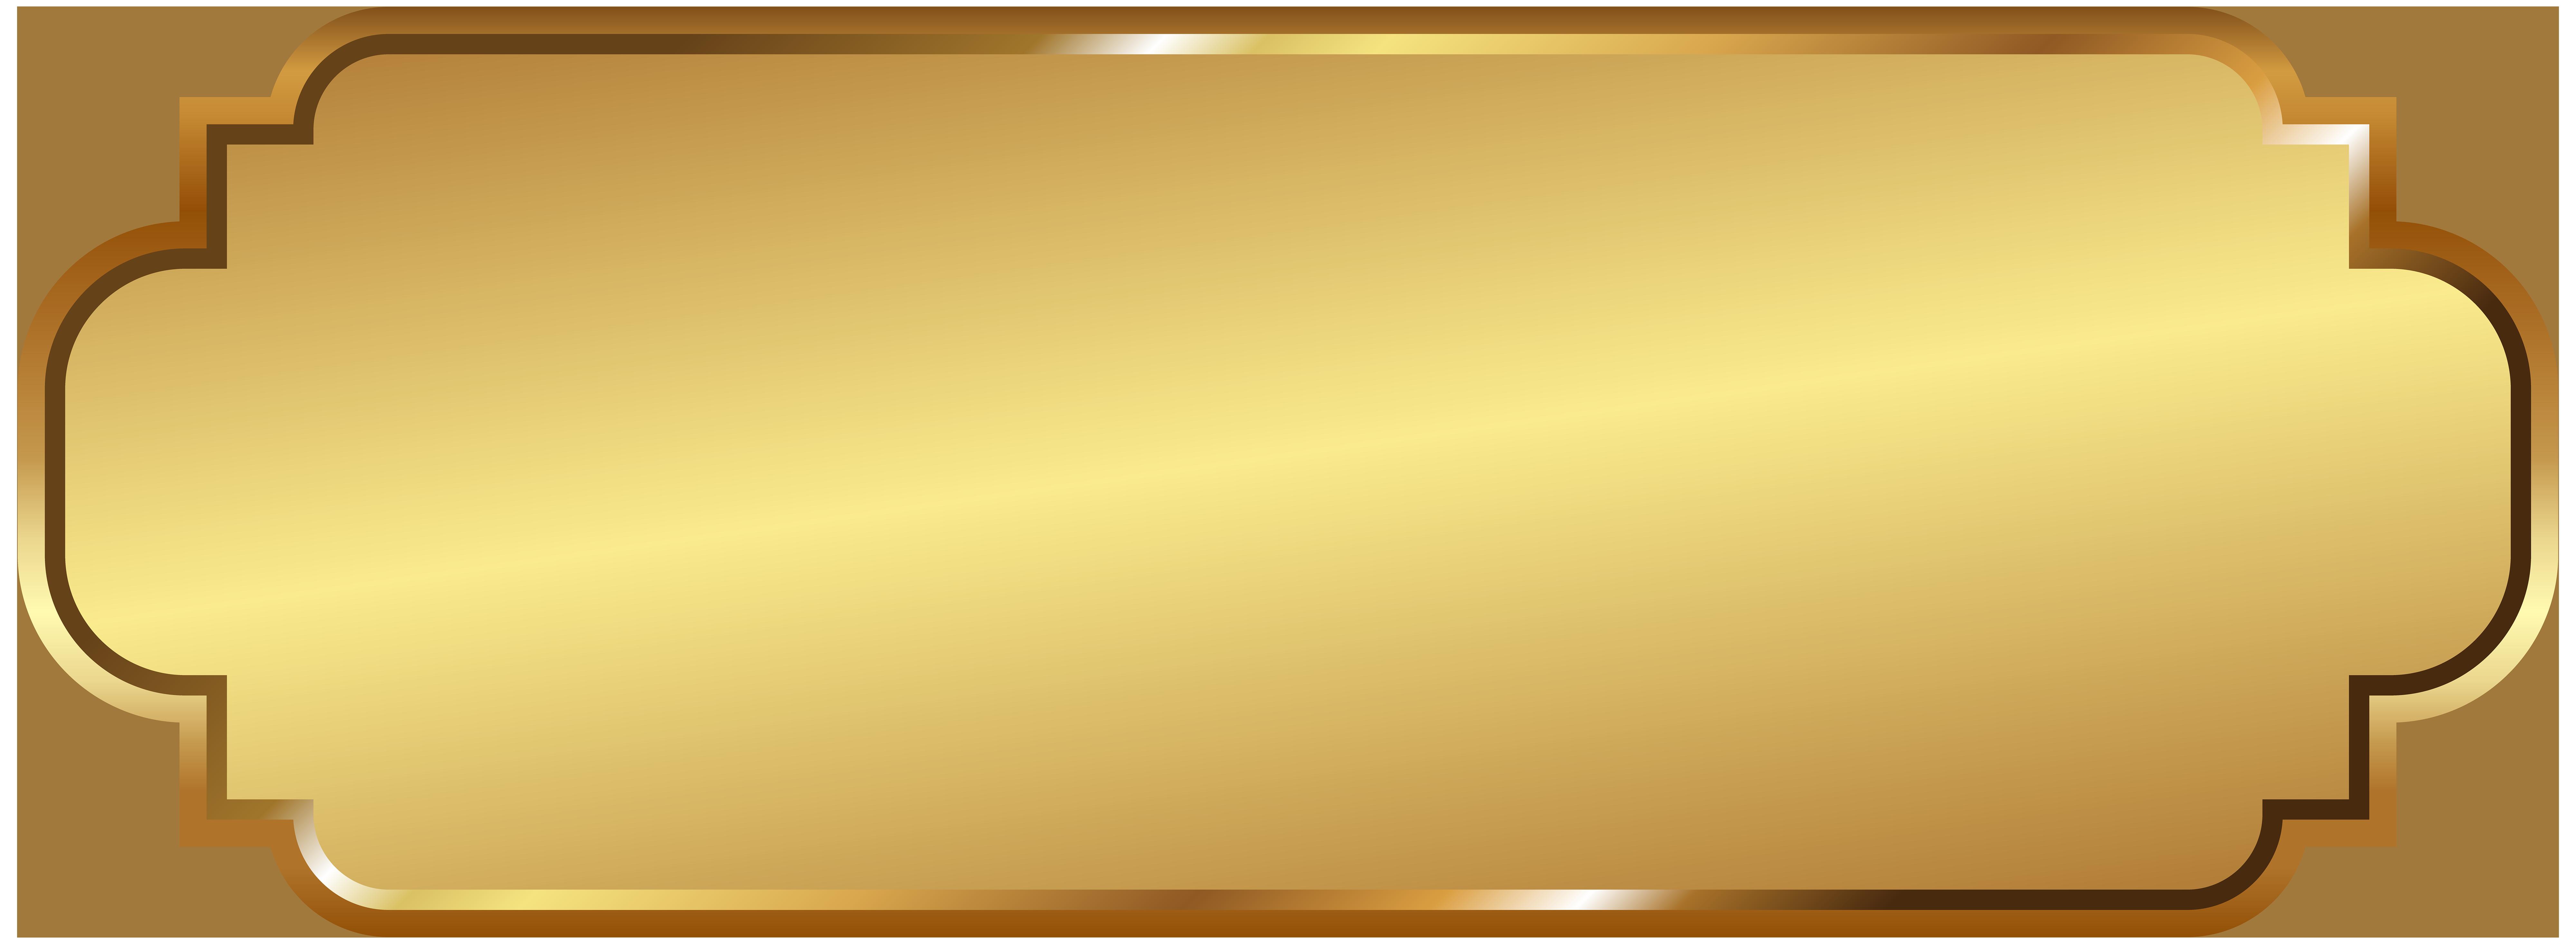 Gold Label Template Png Clip Art Image Gallery Yopriceville High Quality Images And Transparent Png Free C Desain Banner Kartu Pernikahan Fotografi Pemula